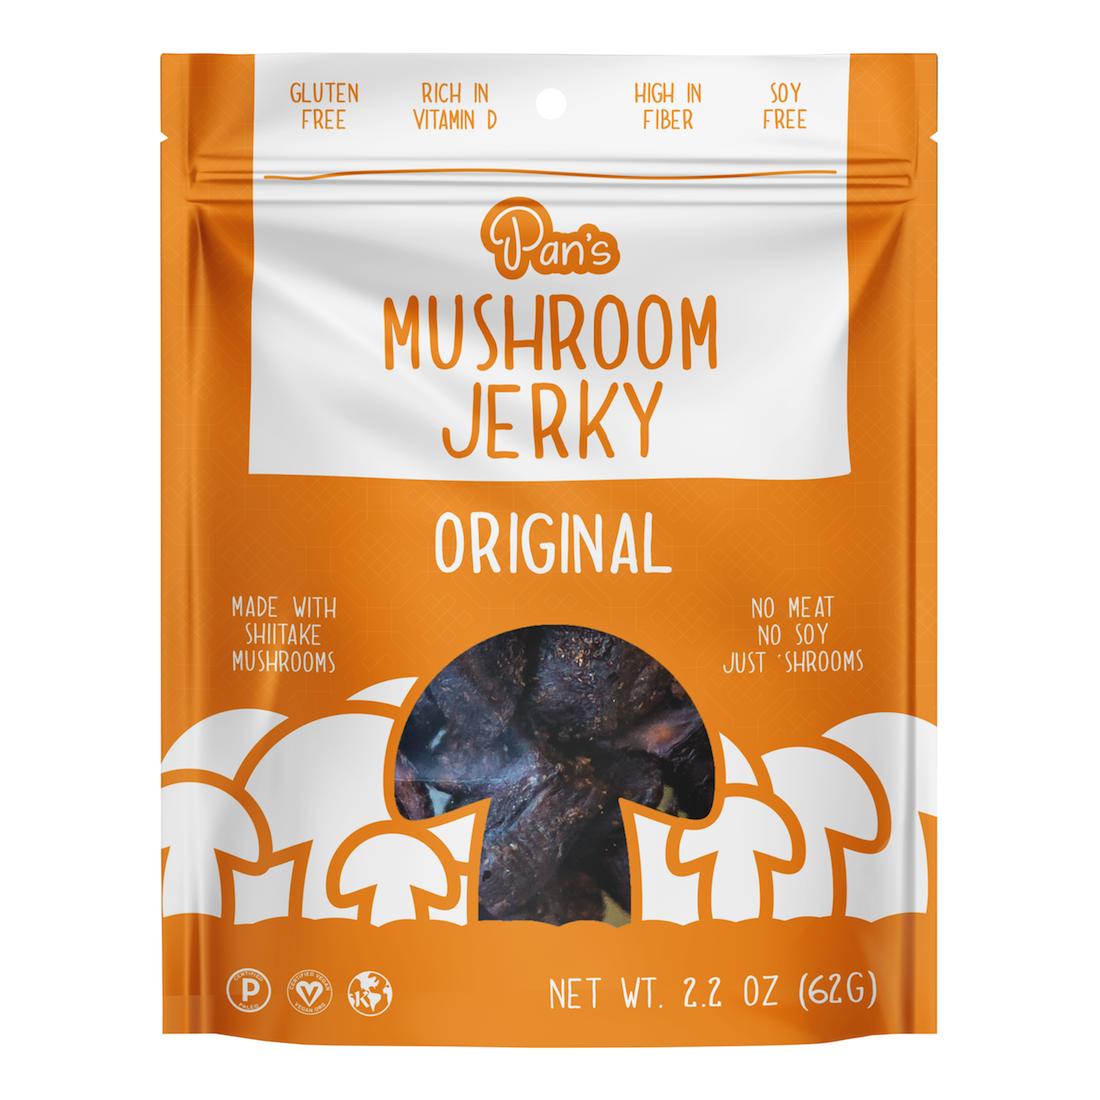 Original - Pan's Mushroom Jerky - Certified Paleo, PaleoVegan by the Paleo Foundation